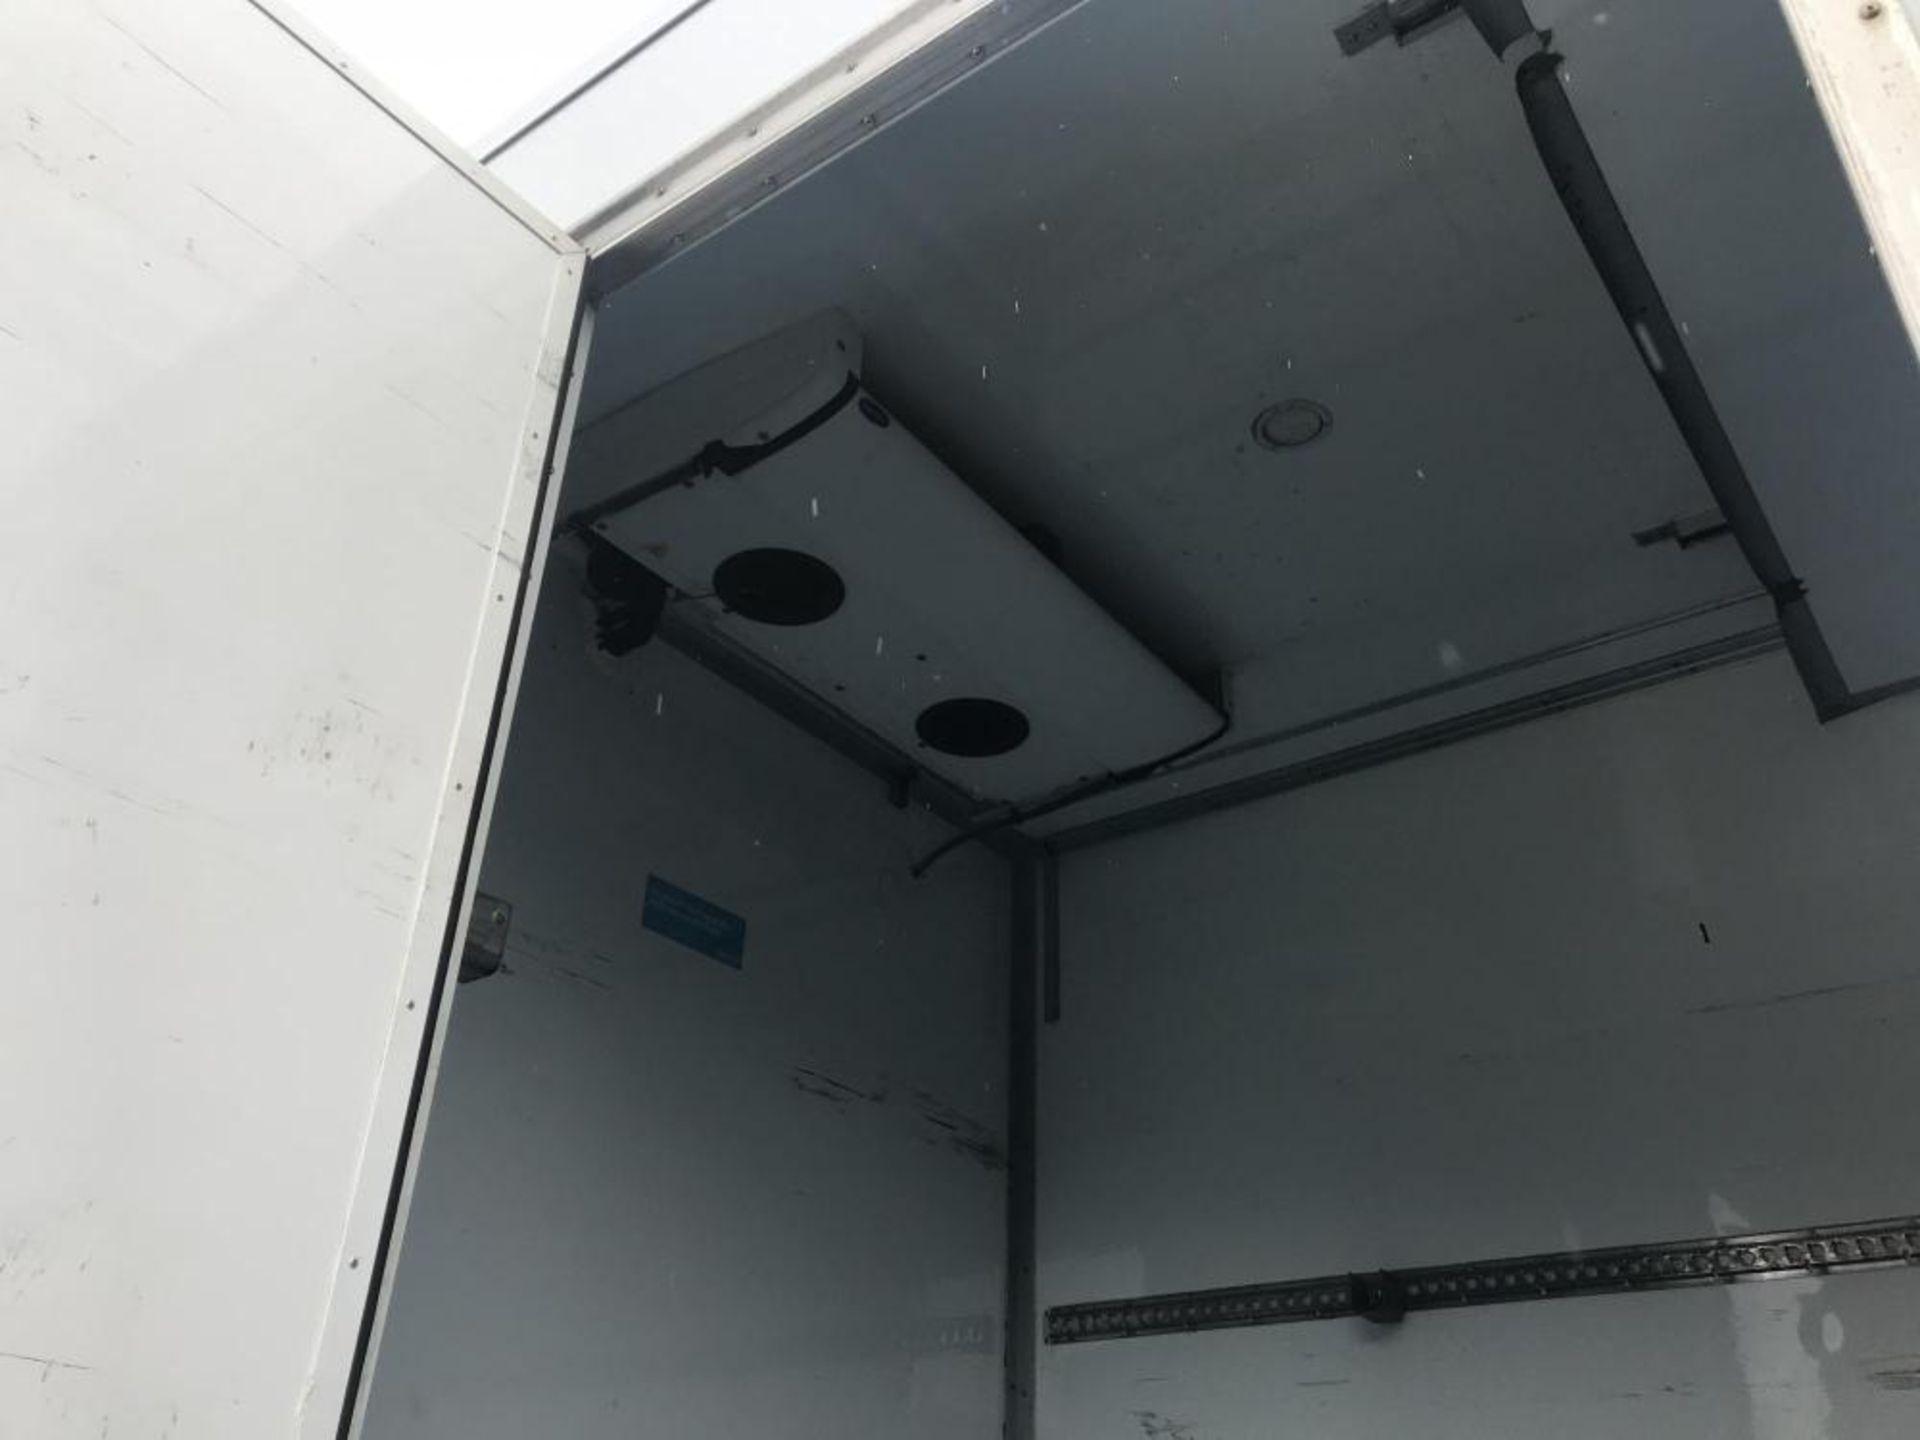 2013/63 REG MERCEDES-BENZ AXOR ATEGO 1824L DAY WHITE FRIDGE BOX TAIL LIFT AIR SUSPENSION *PLUS VAT* - Image 19 of 21